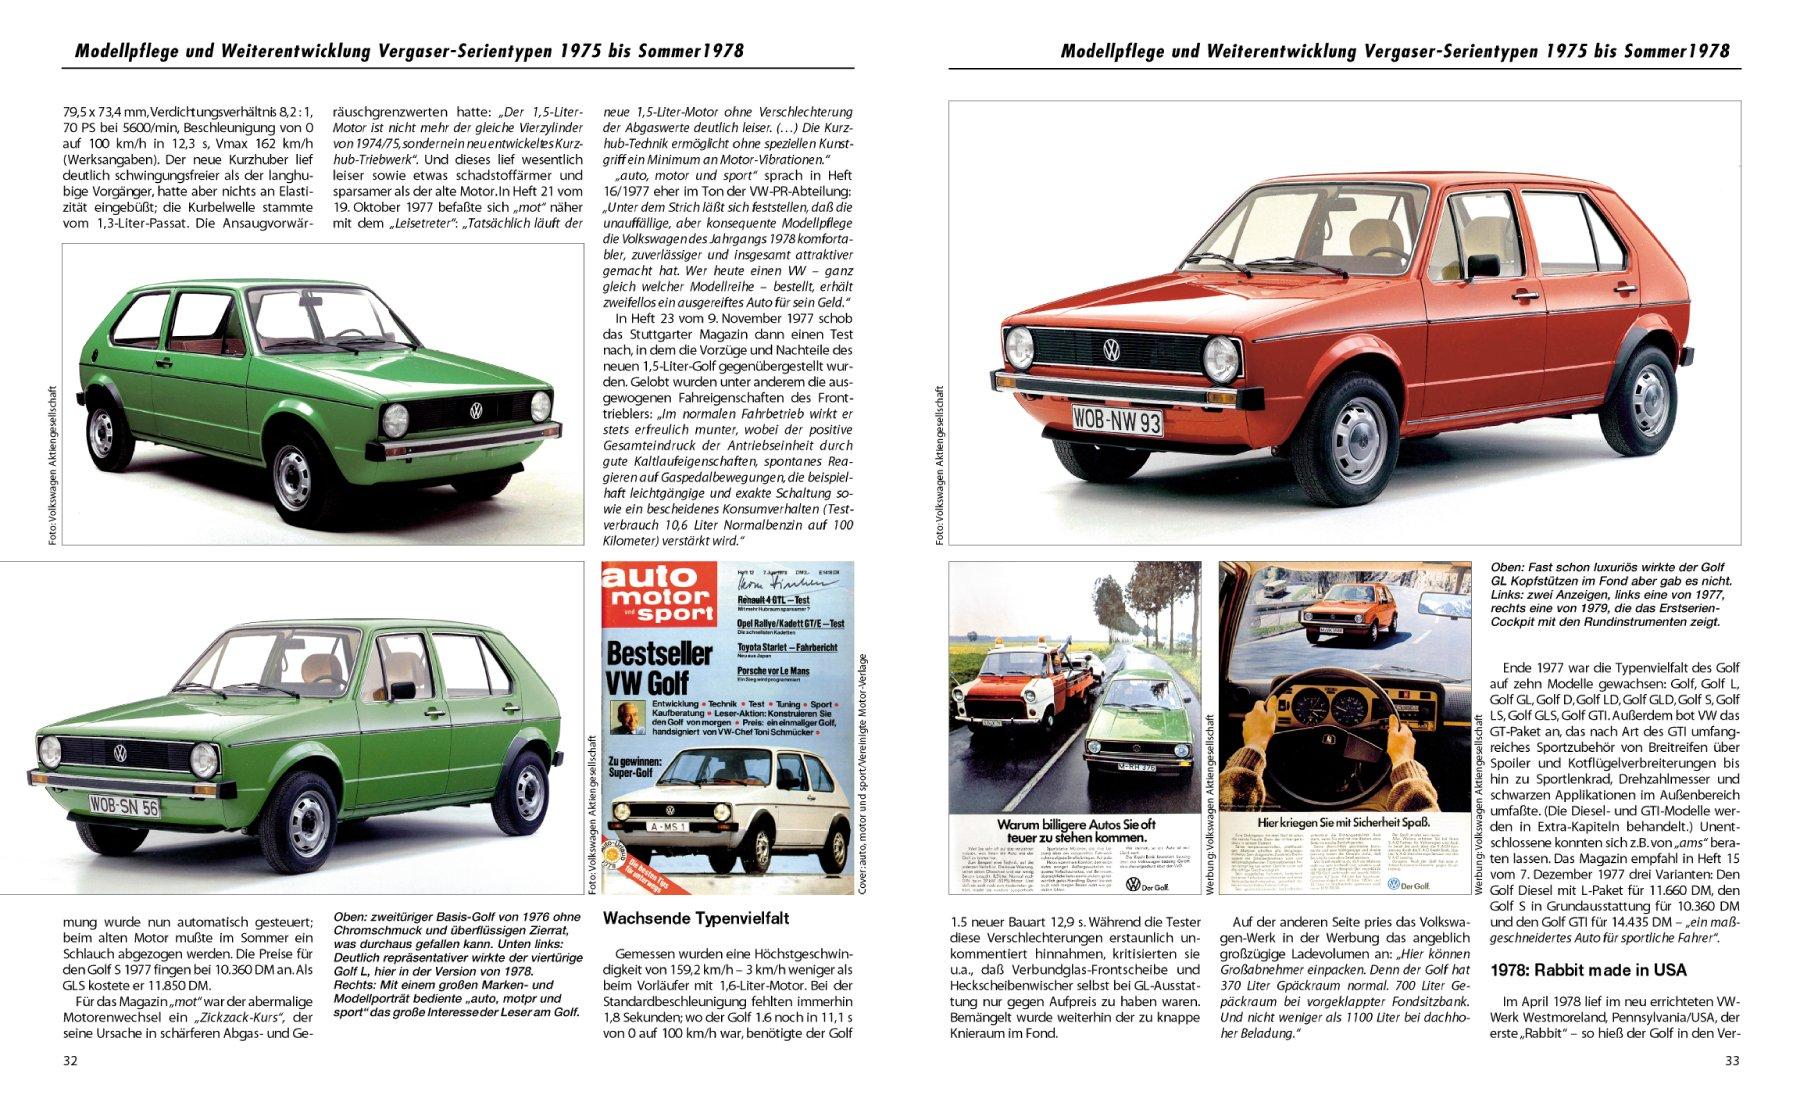 VW Golf 1: Modellgeschichte, Kaufberatung, Pannenhilfe Passion ...